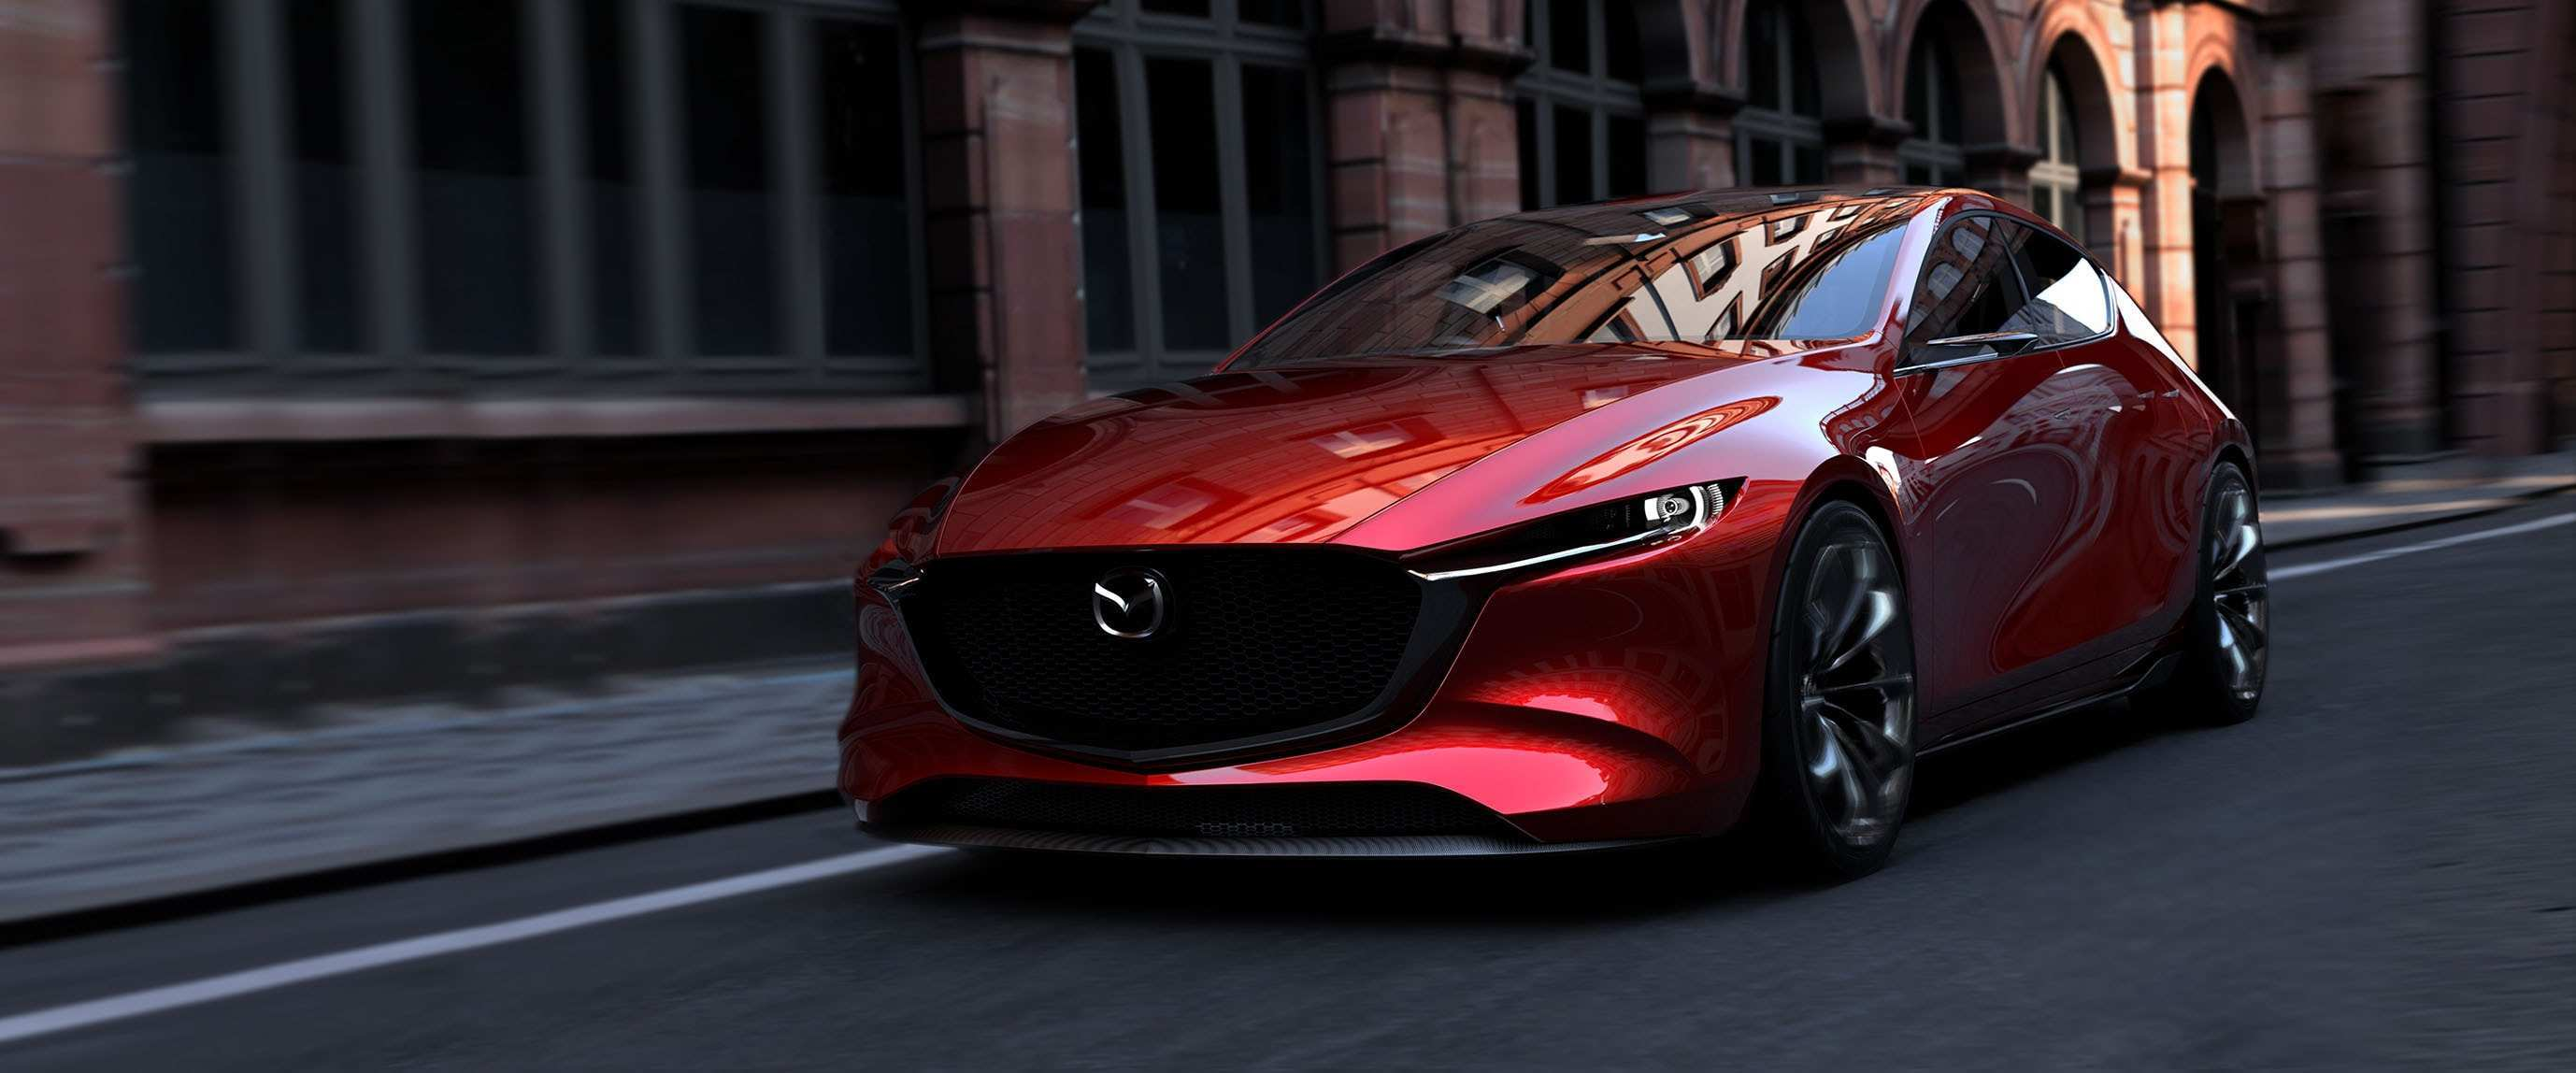 99 All New Next Gen Mazda 6 2020 Performance for Next Gen Mazda 6 2020